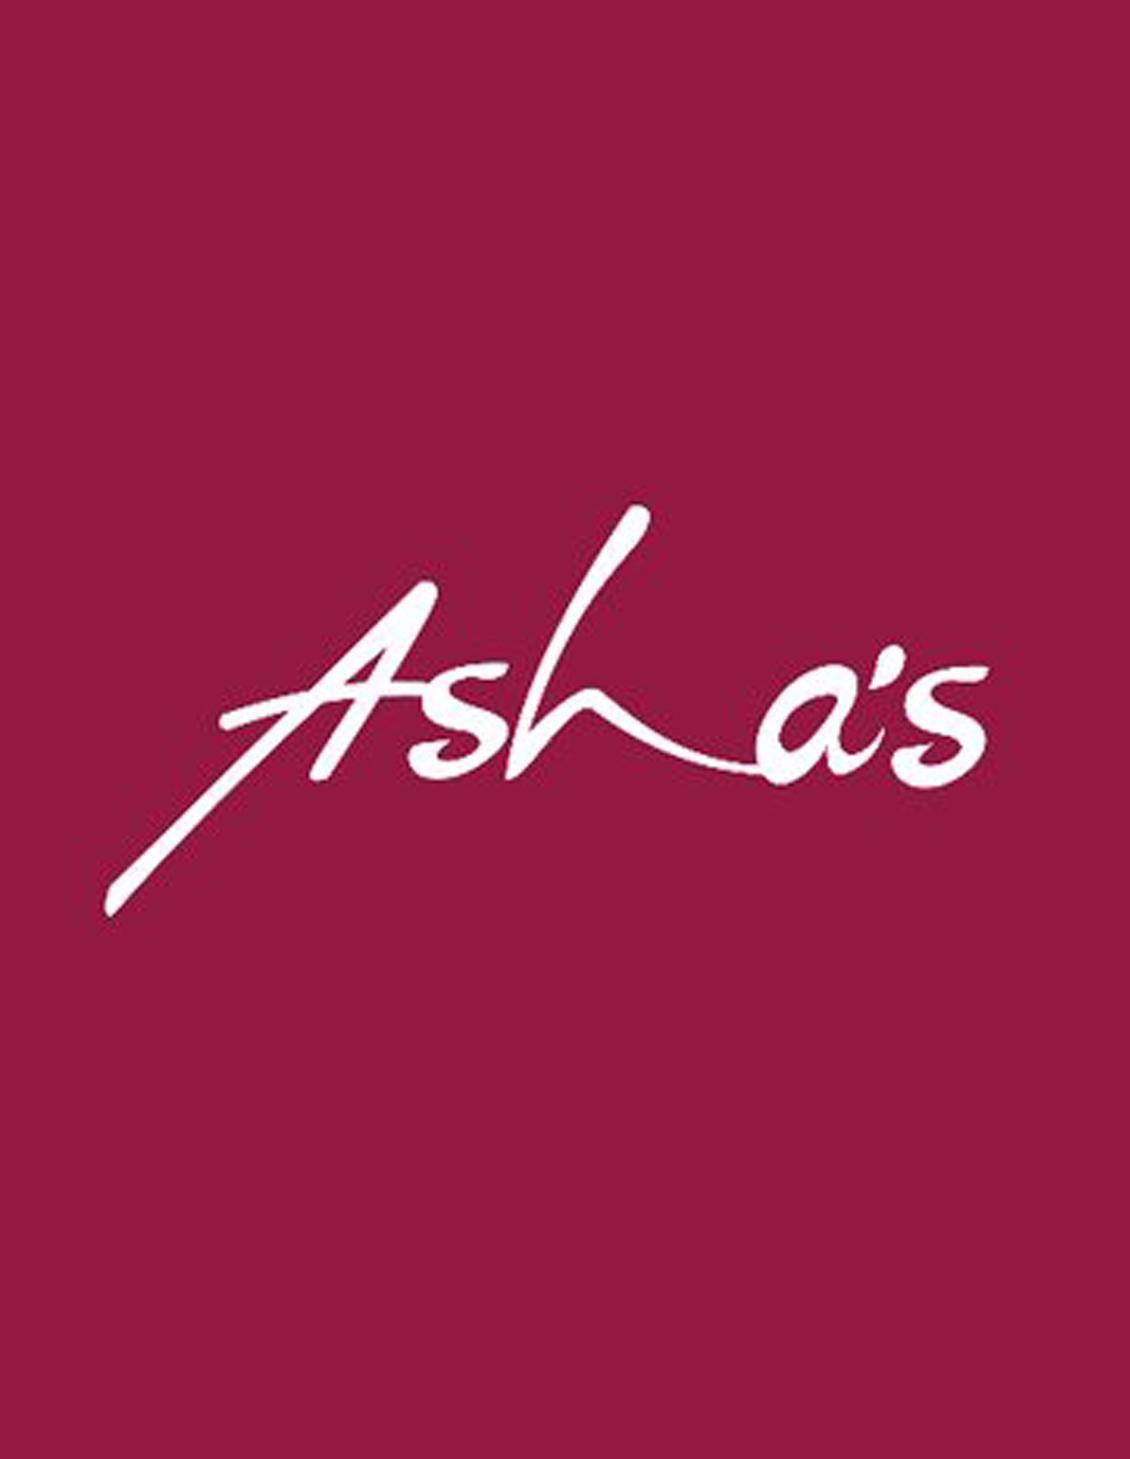 Ashas